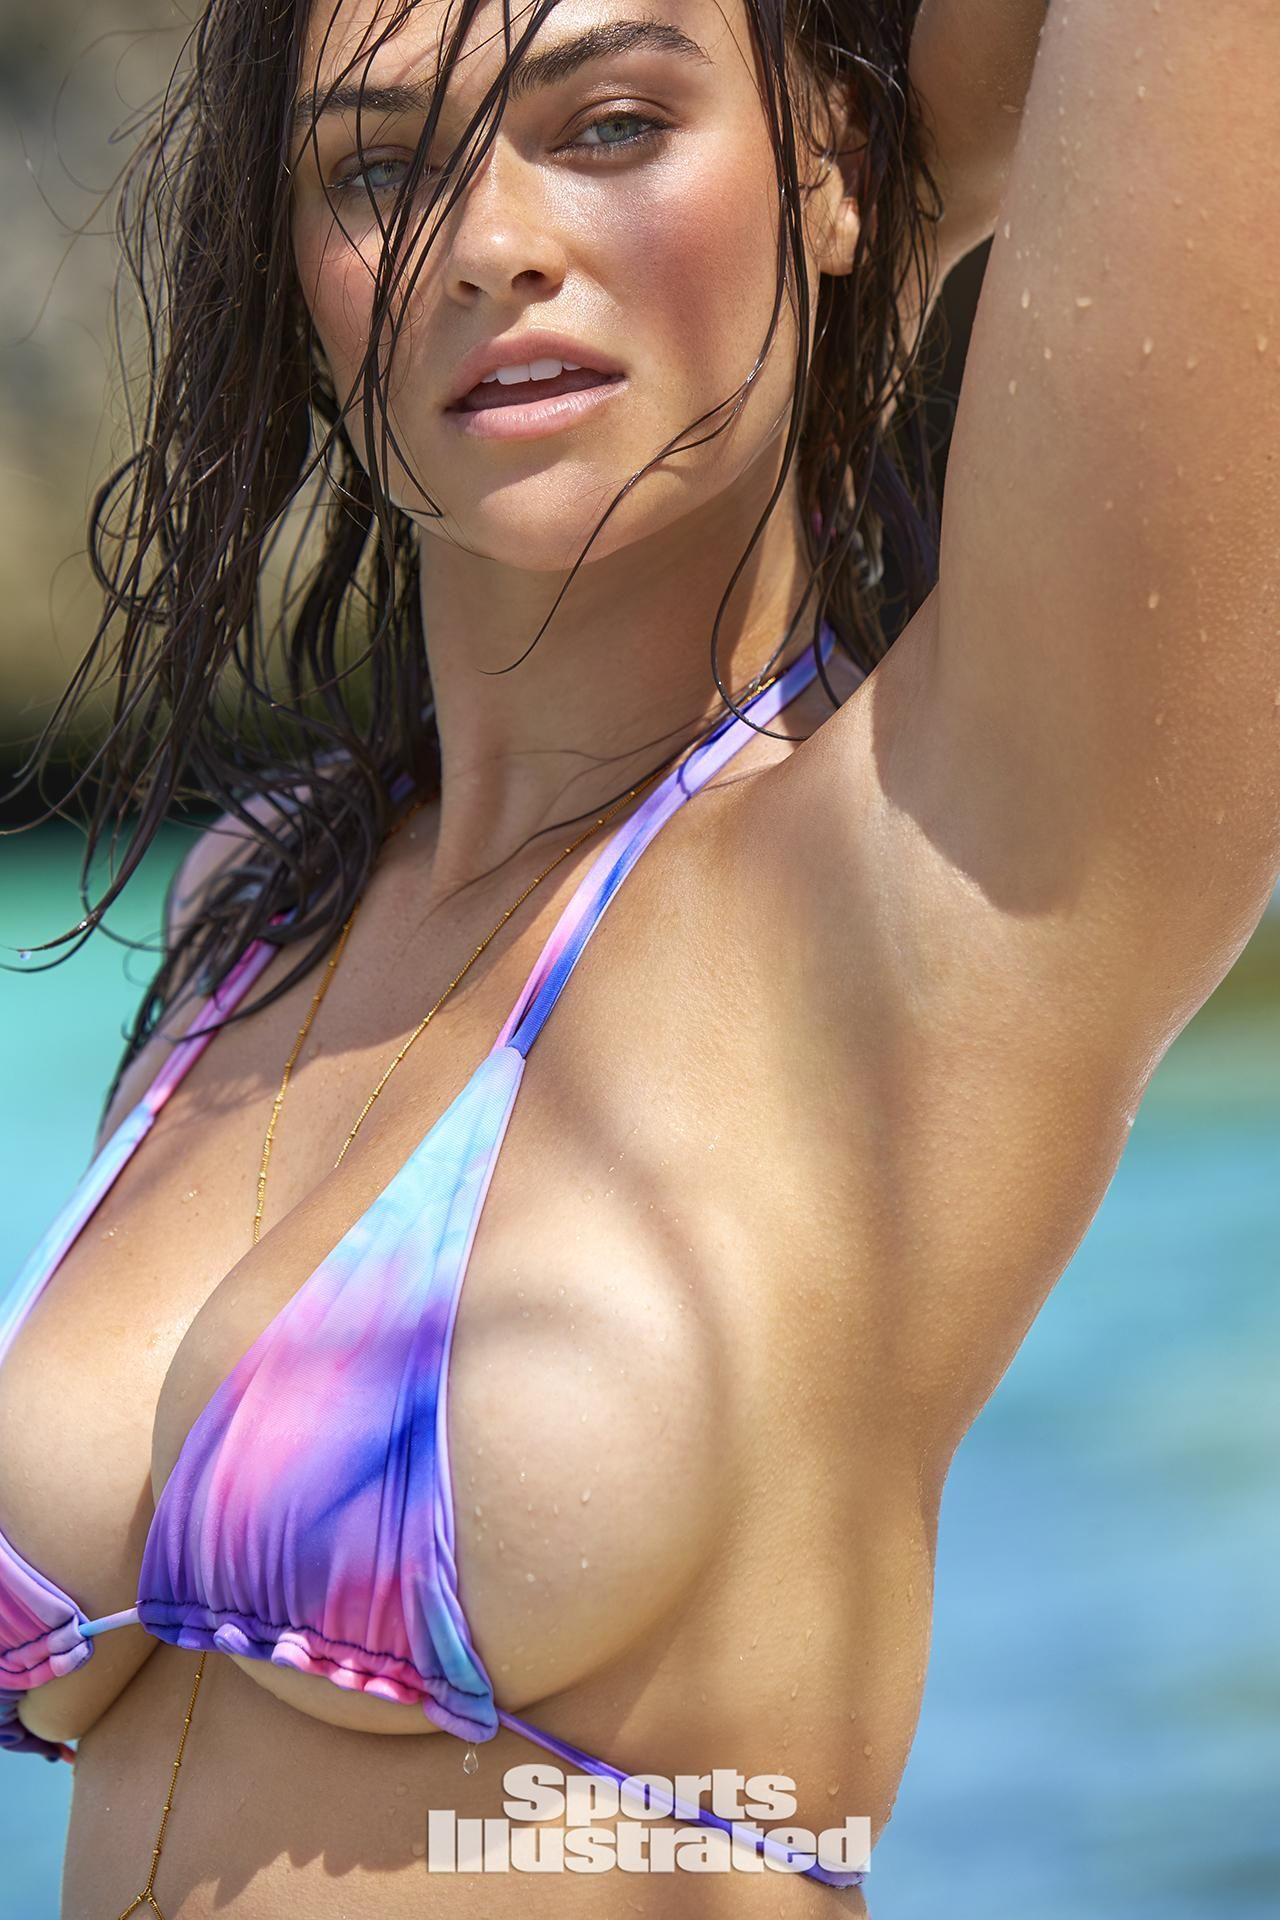 Cleavage Myla Dalbesio nude (76 photos), Topless, Sideboobs, Feet, bra 2015